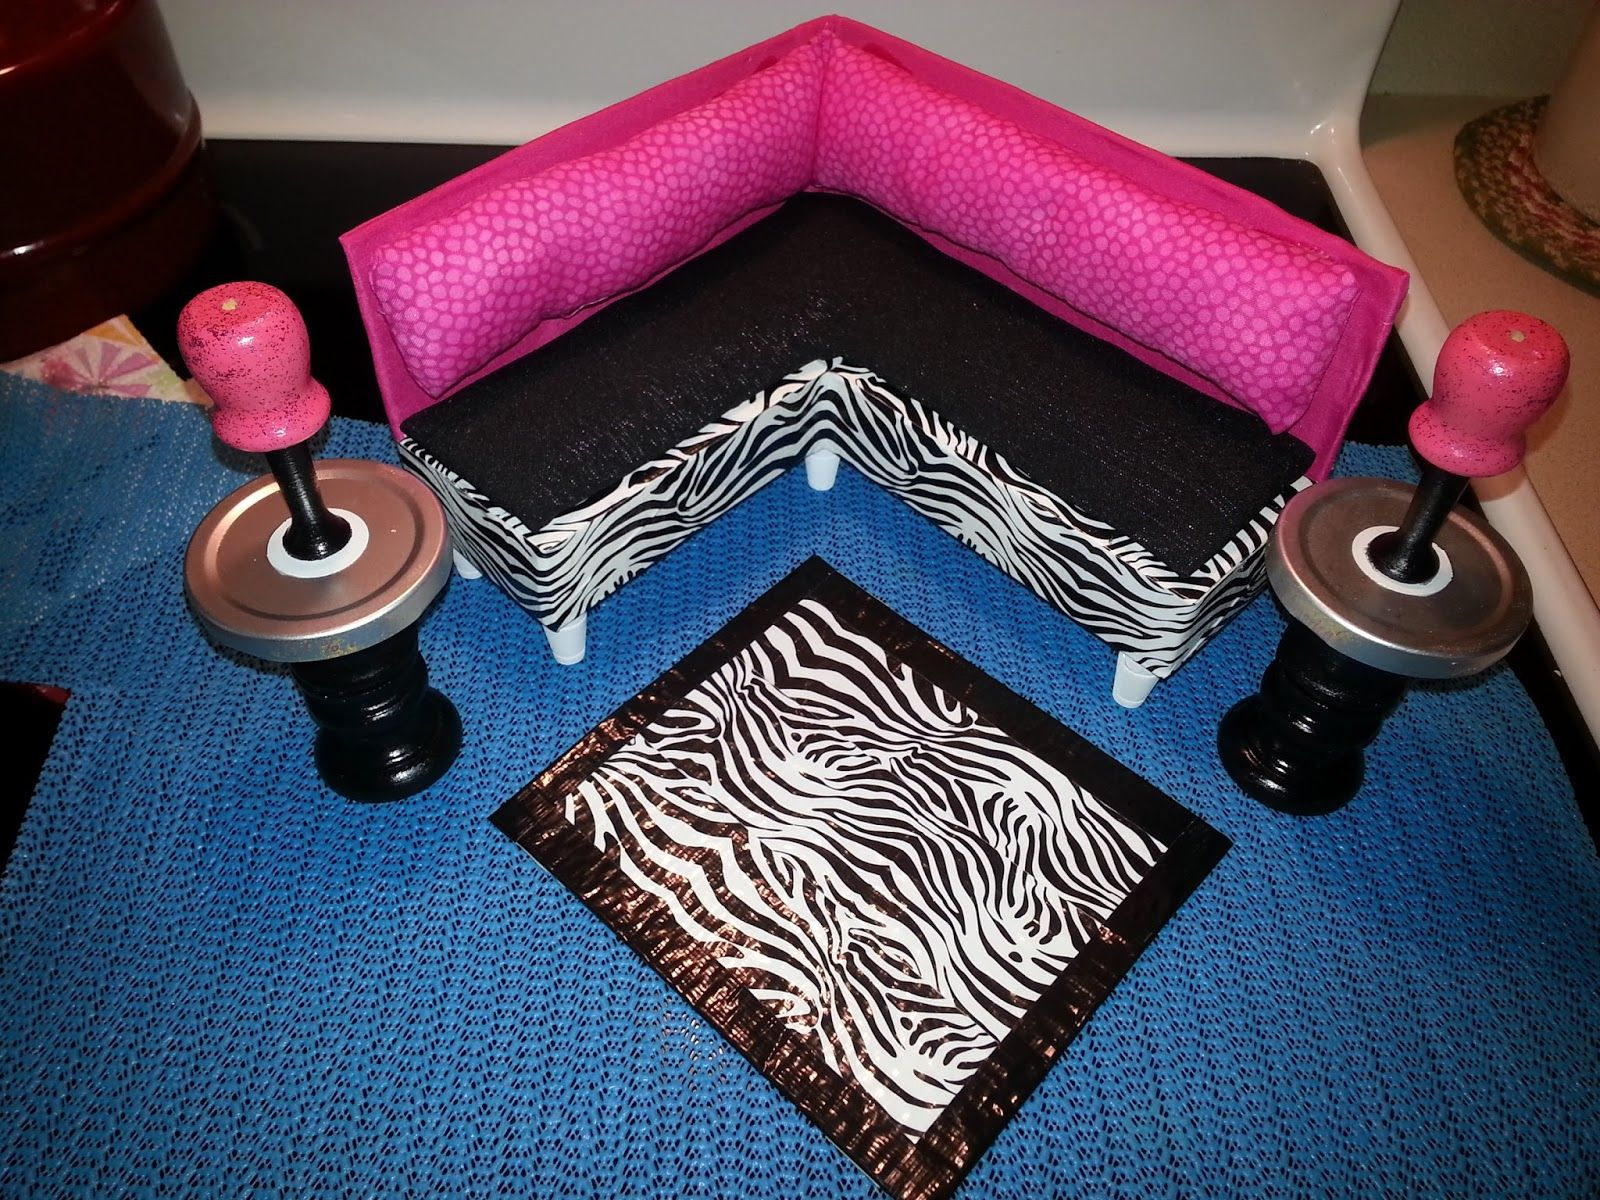 diy barbie doll furniture. simple livin: diy barbie doll furniture from a spaghetti box diy u